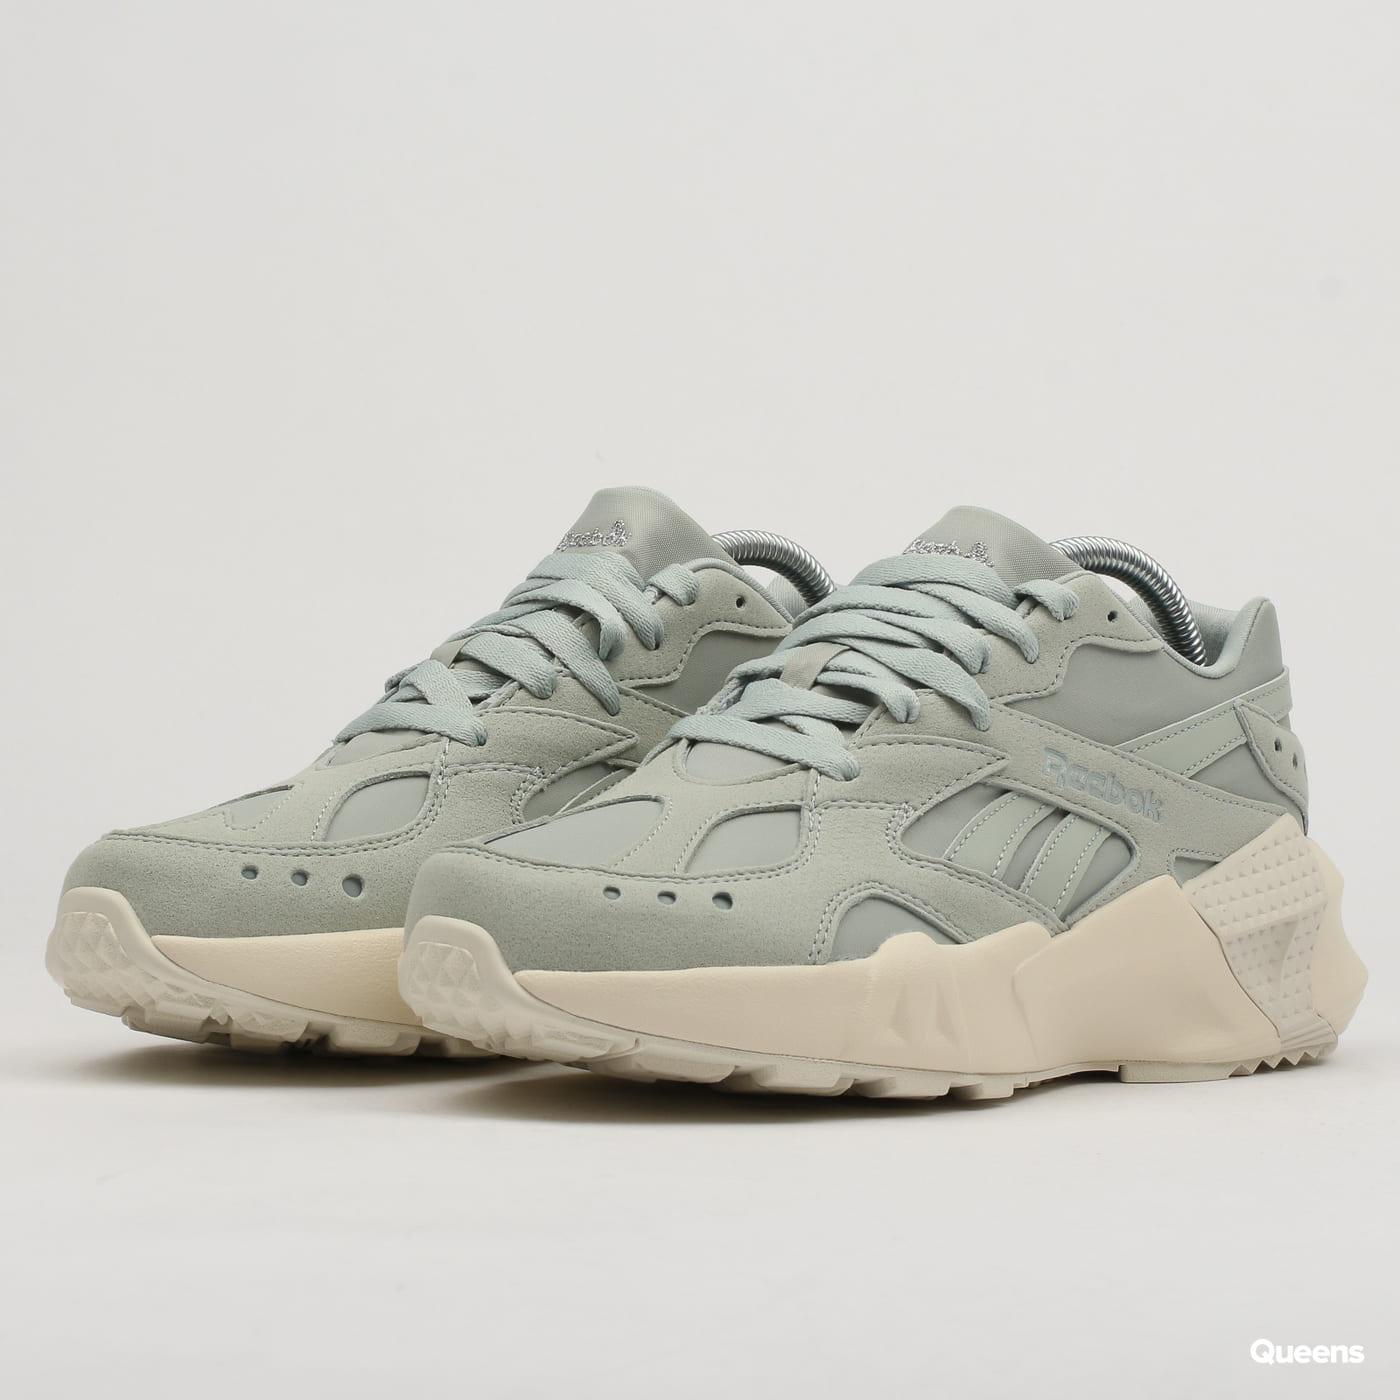 Sneakers Reebok Aztrek Double 93 sea